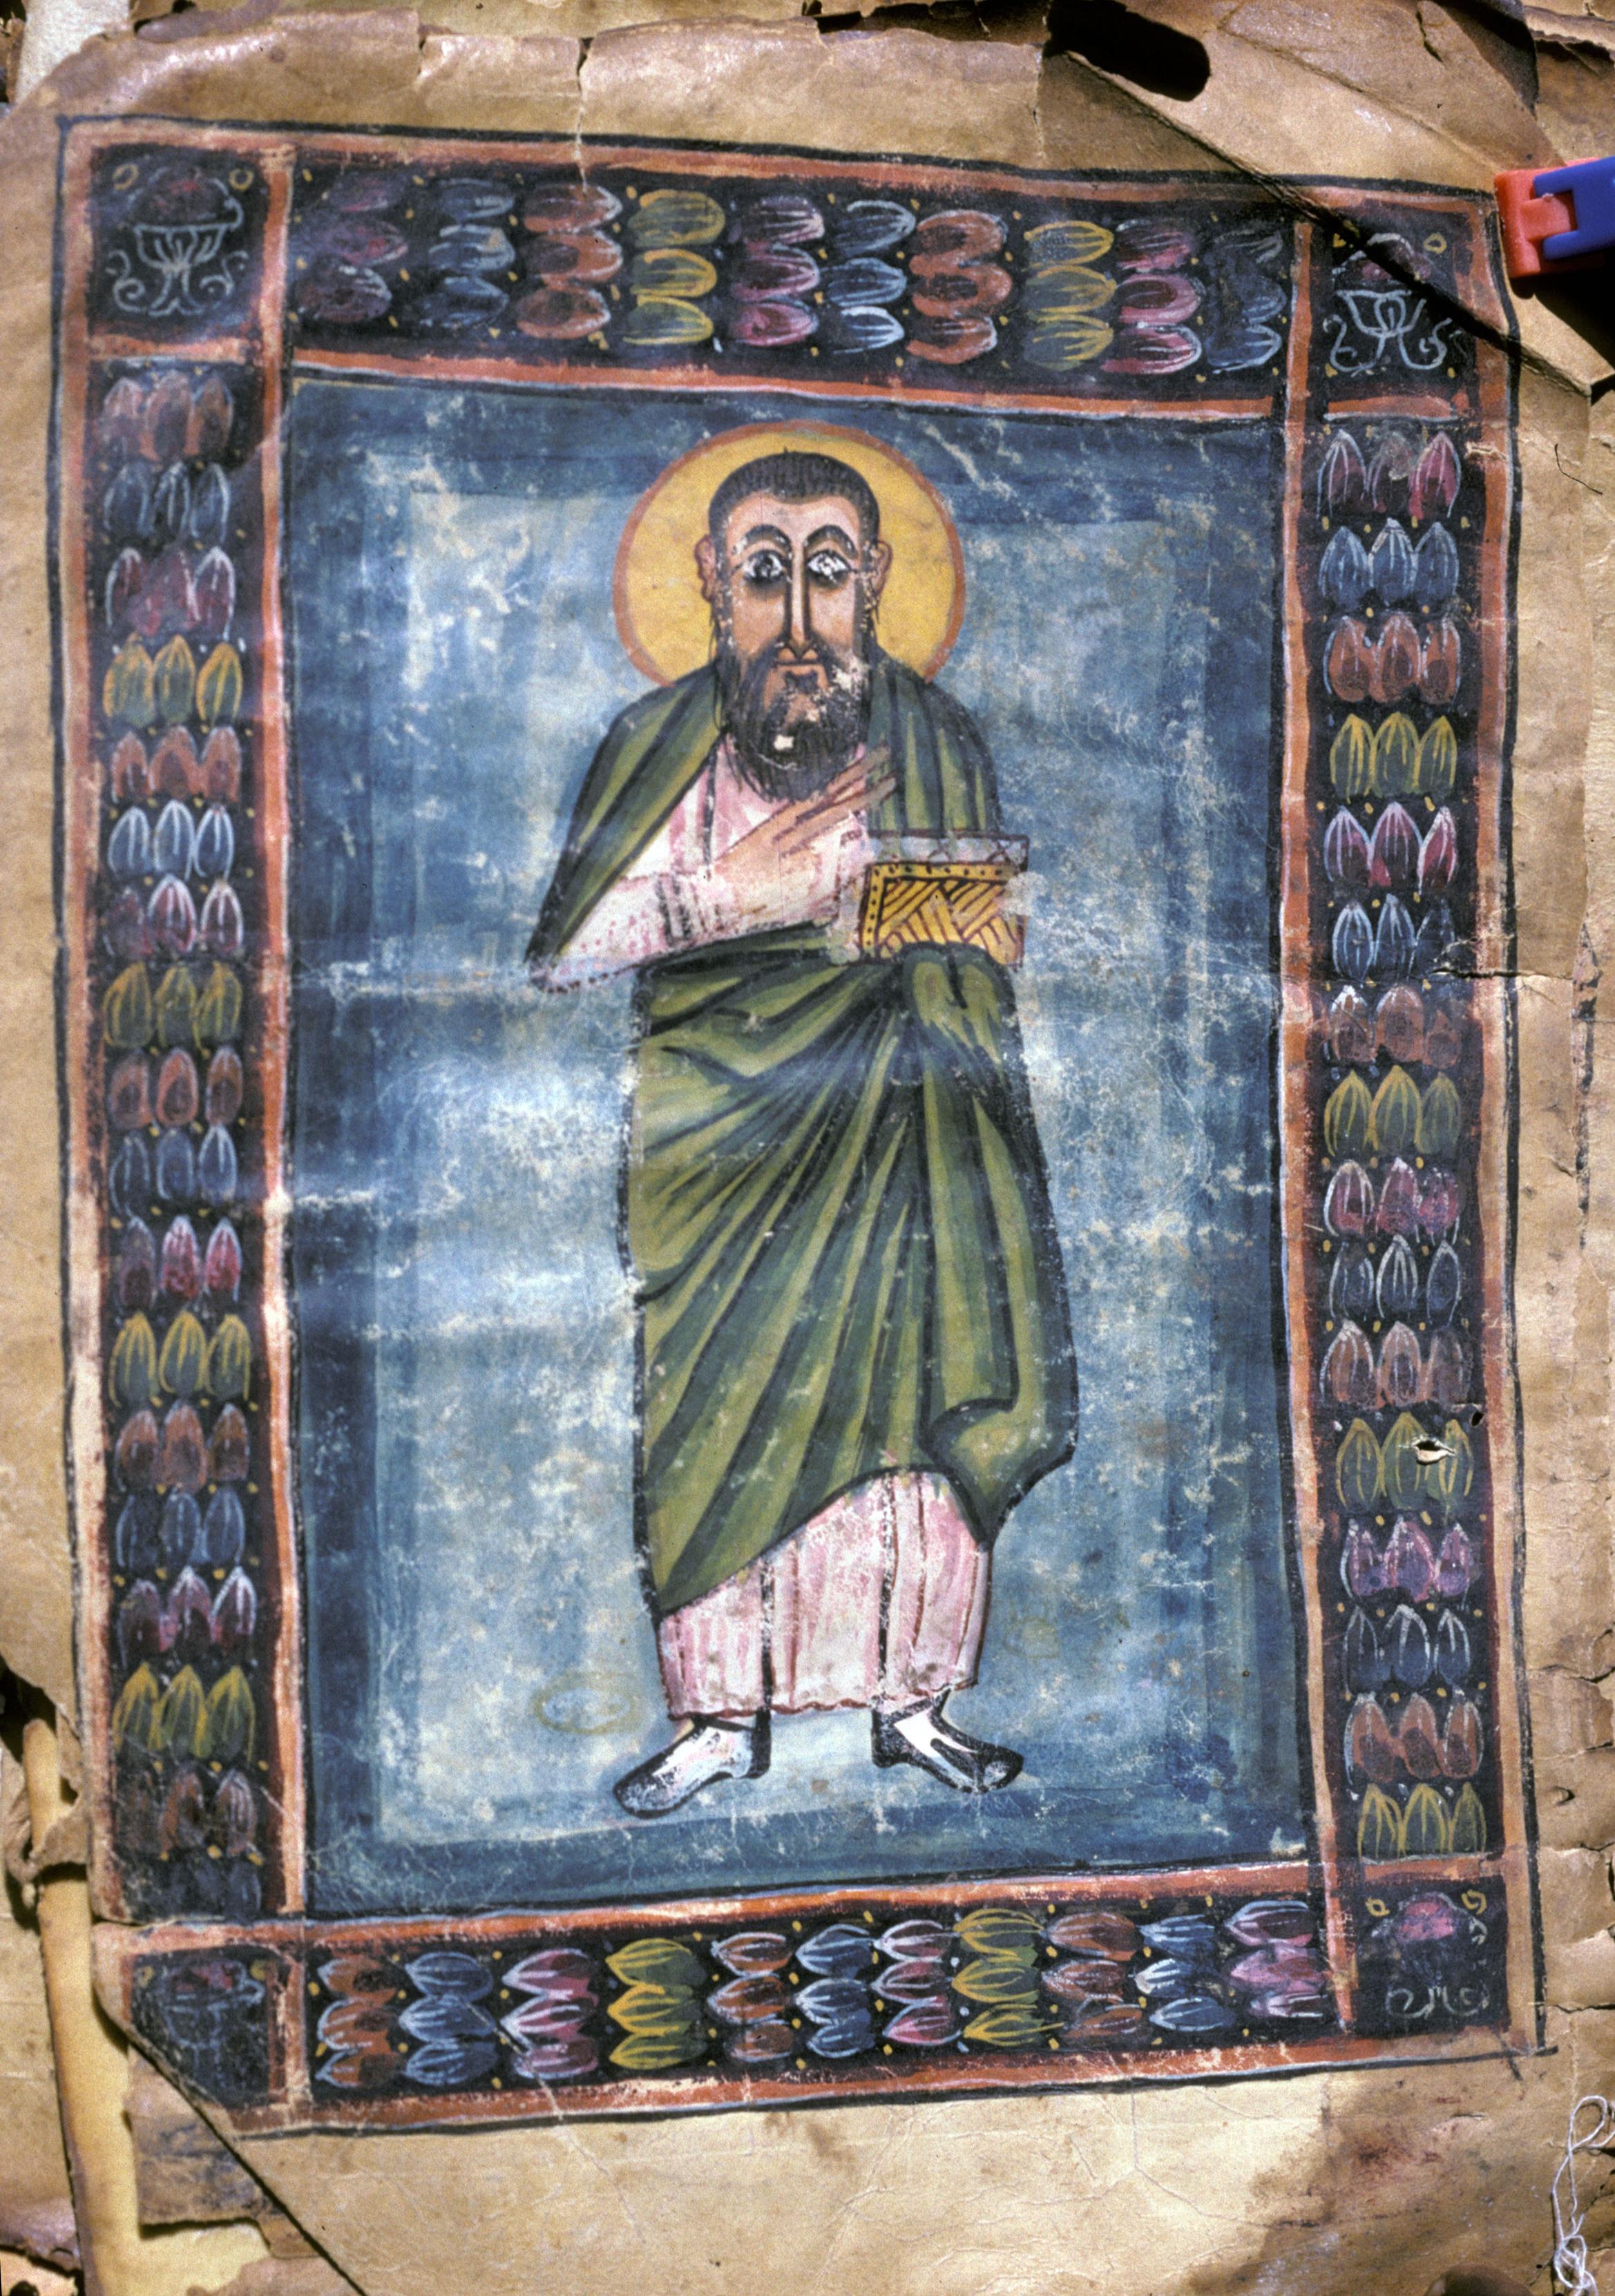 Eusebius of Caesarea (?), Abba Garima II, fol. 259v